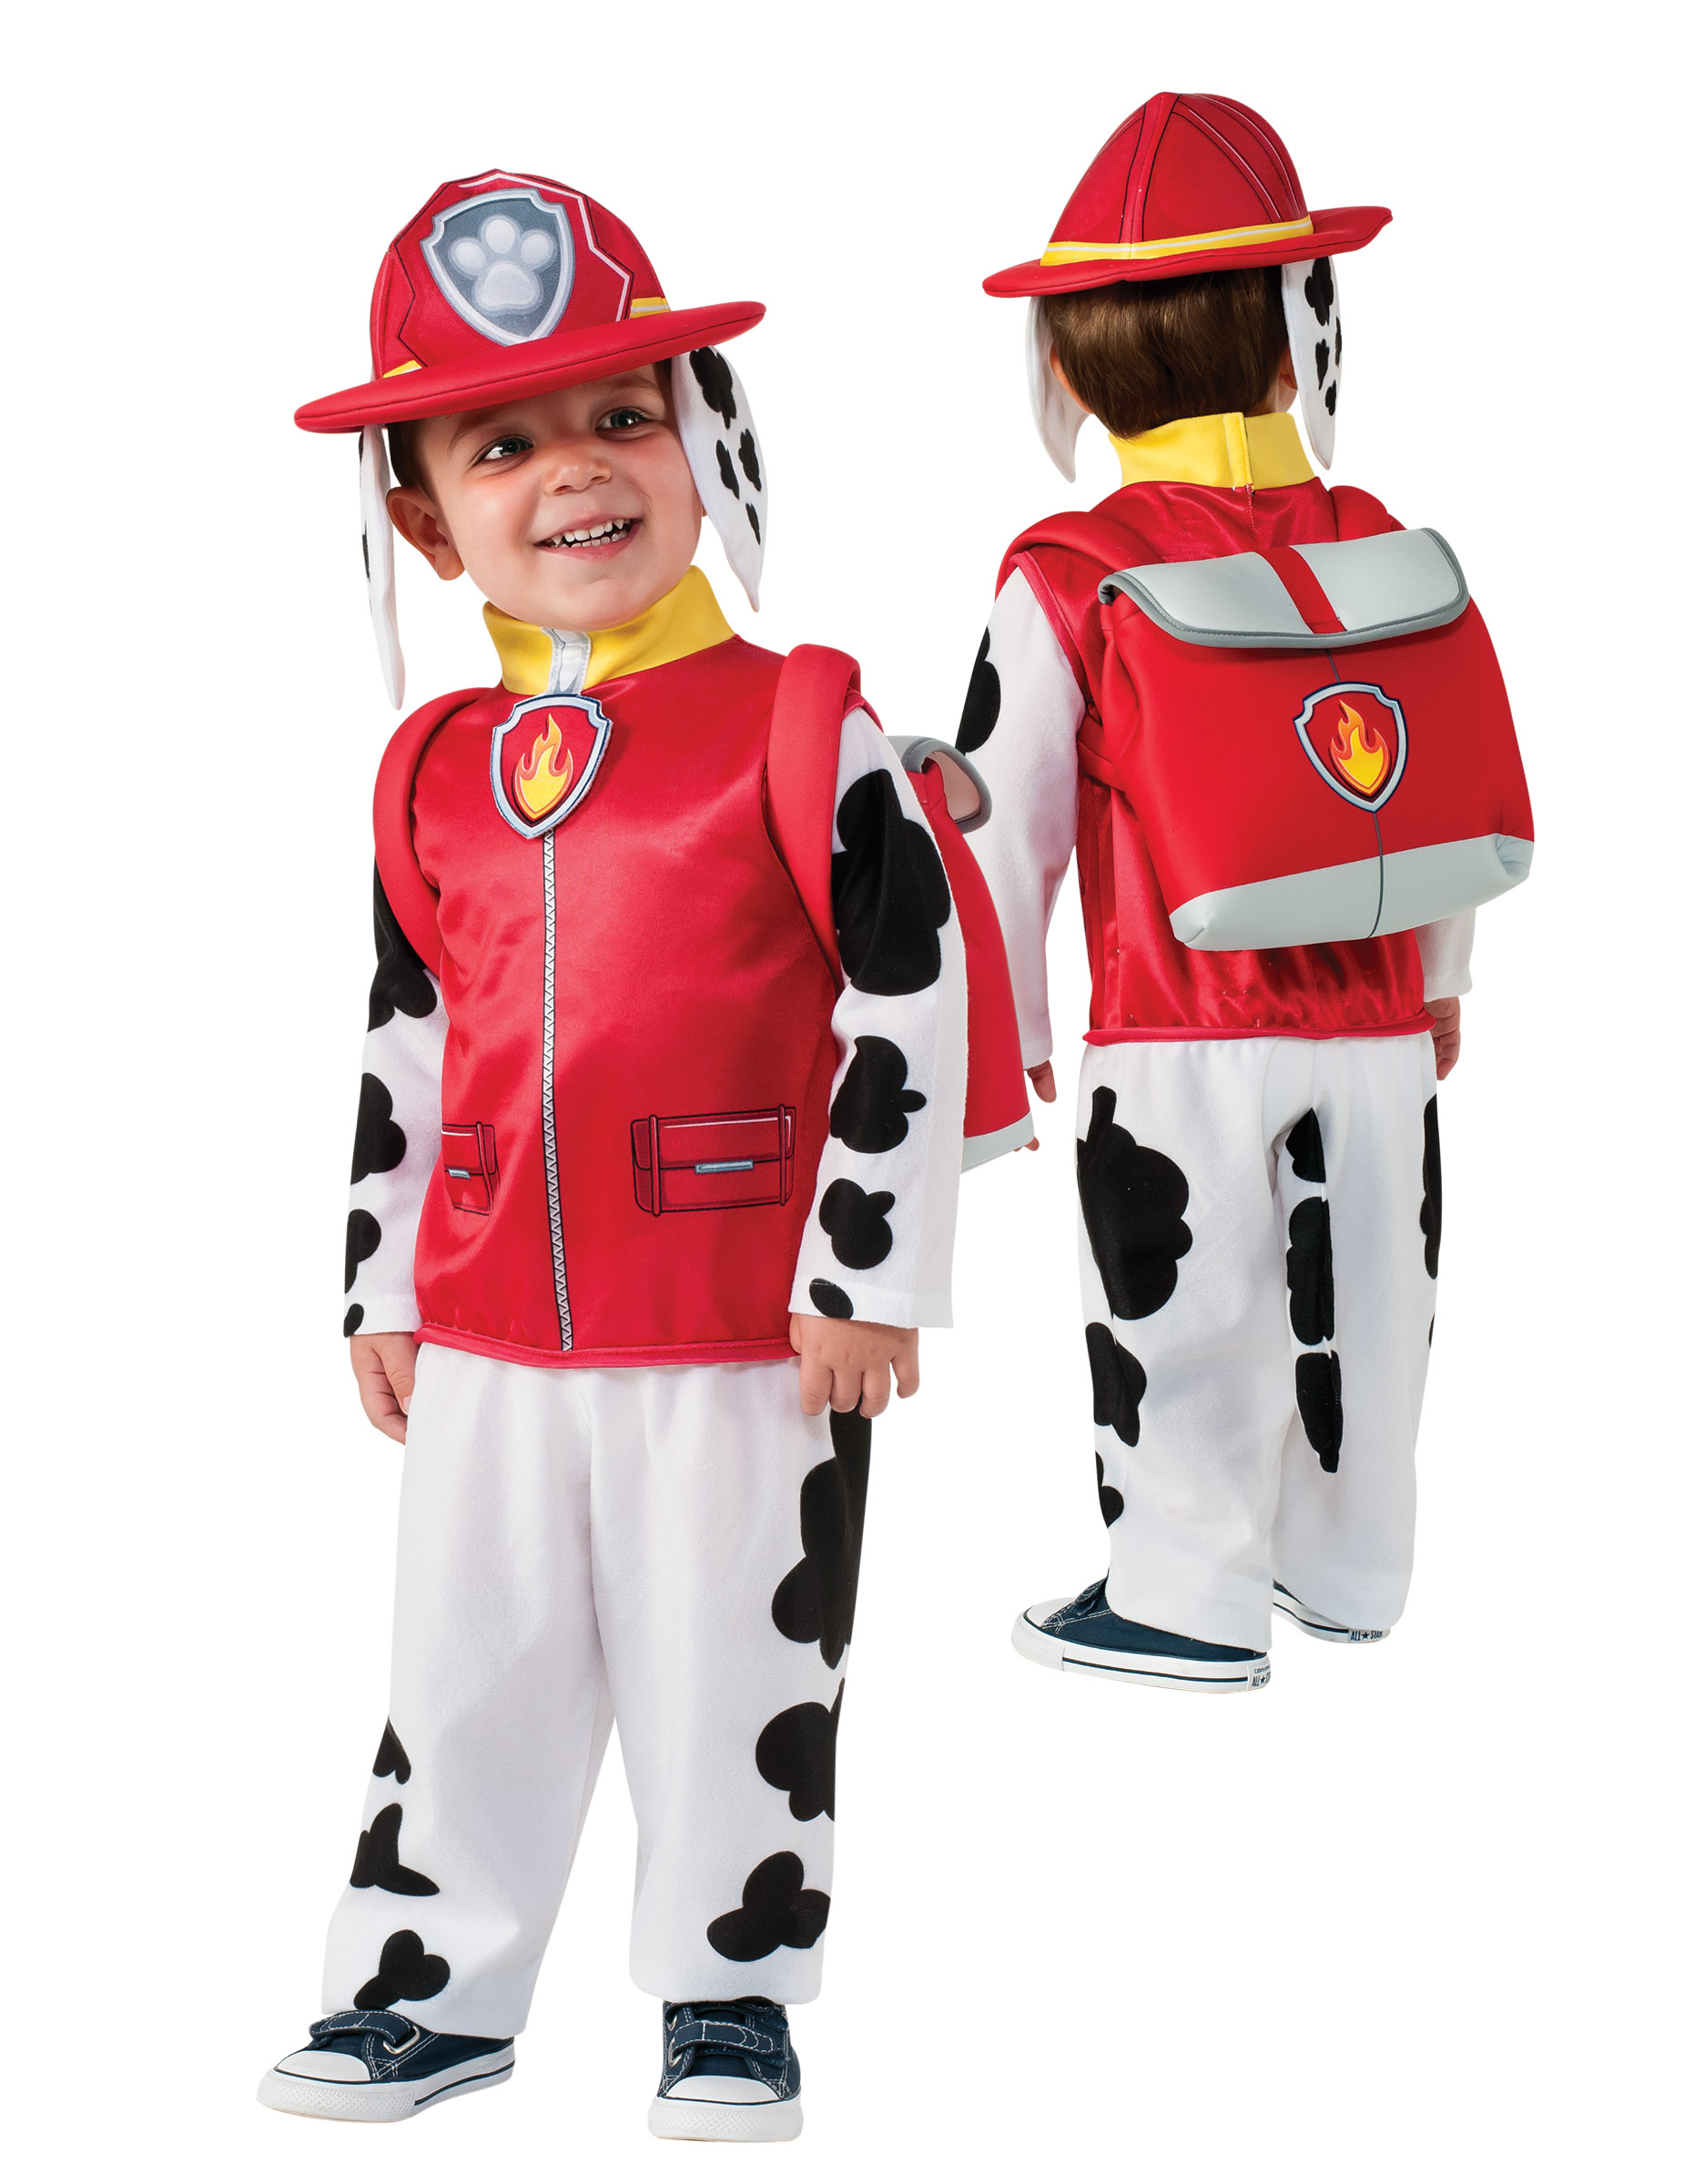 39358061a62b Costume Pompiere Marshall Paw Patrol™ per bambino: Costumi bambini,e ...